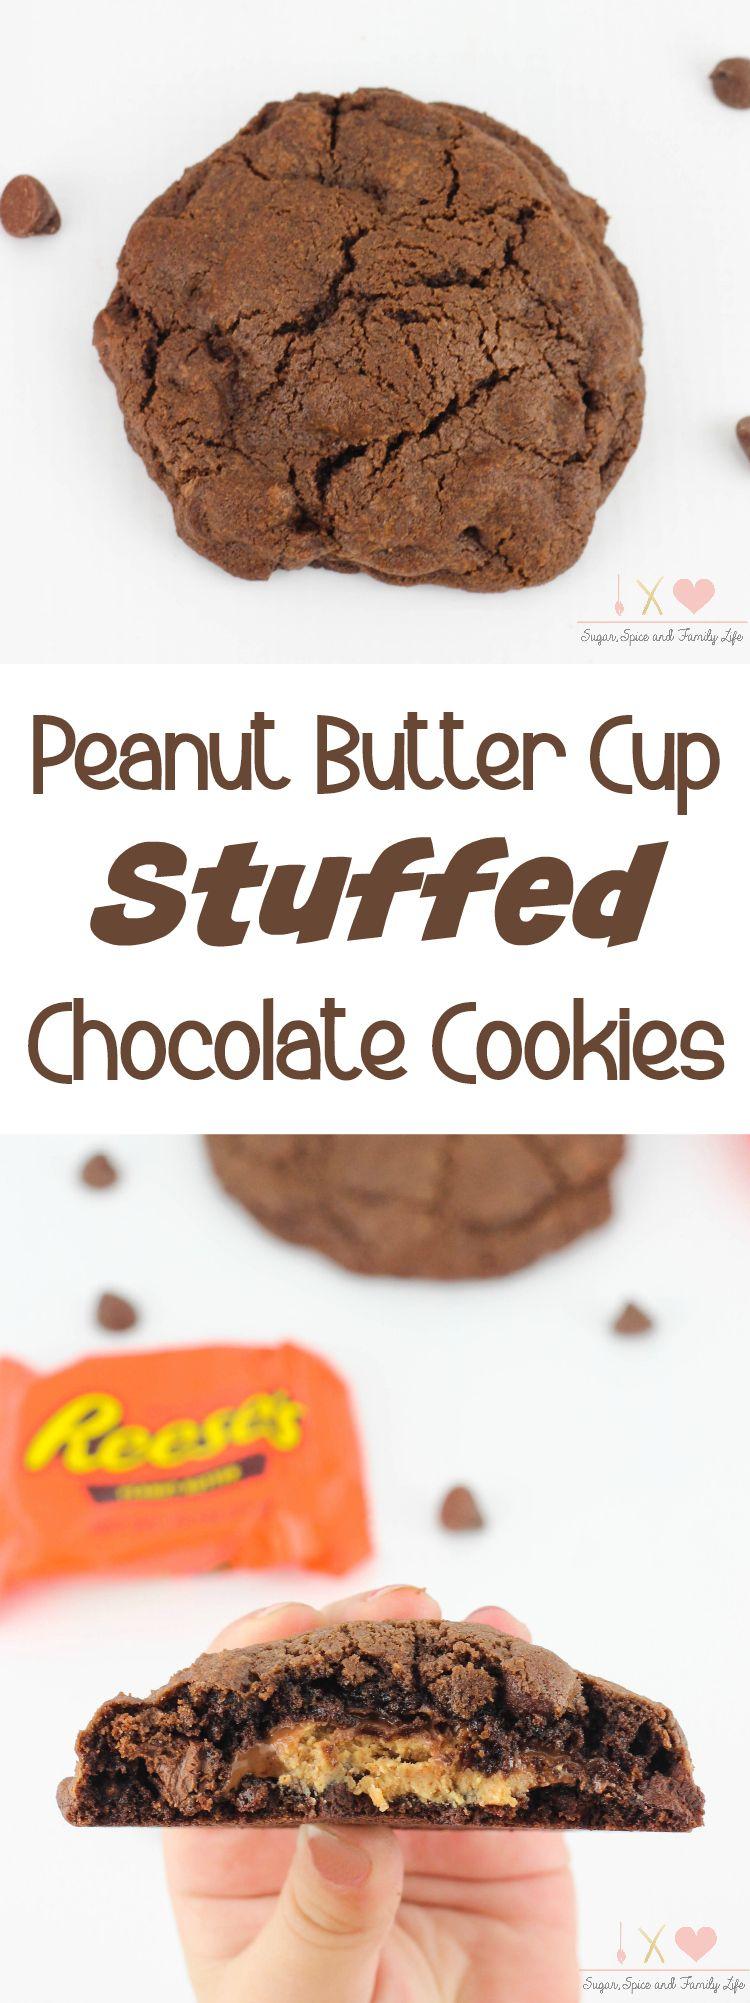 Peanut butter cup stuffed chocolate cookies recipe sugar